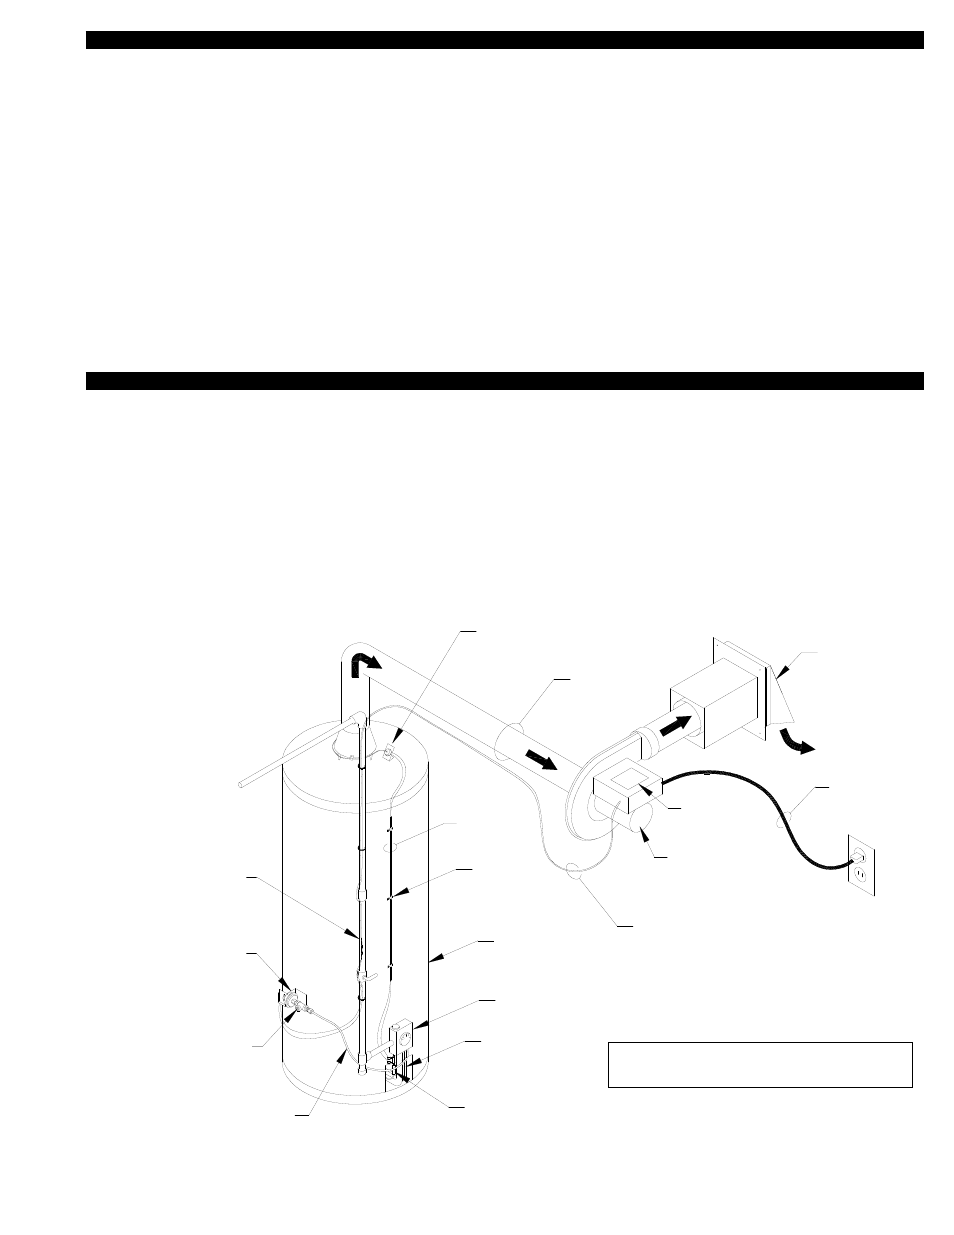 medium resolution of tjernlund vp 2f vp 3f airotronics timer 8504140 rev a 11 11 user manual page 3 15